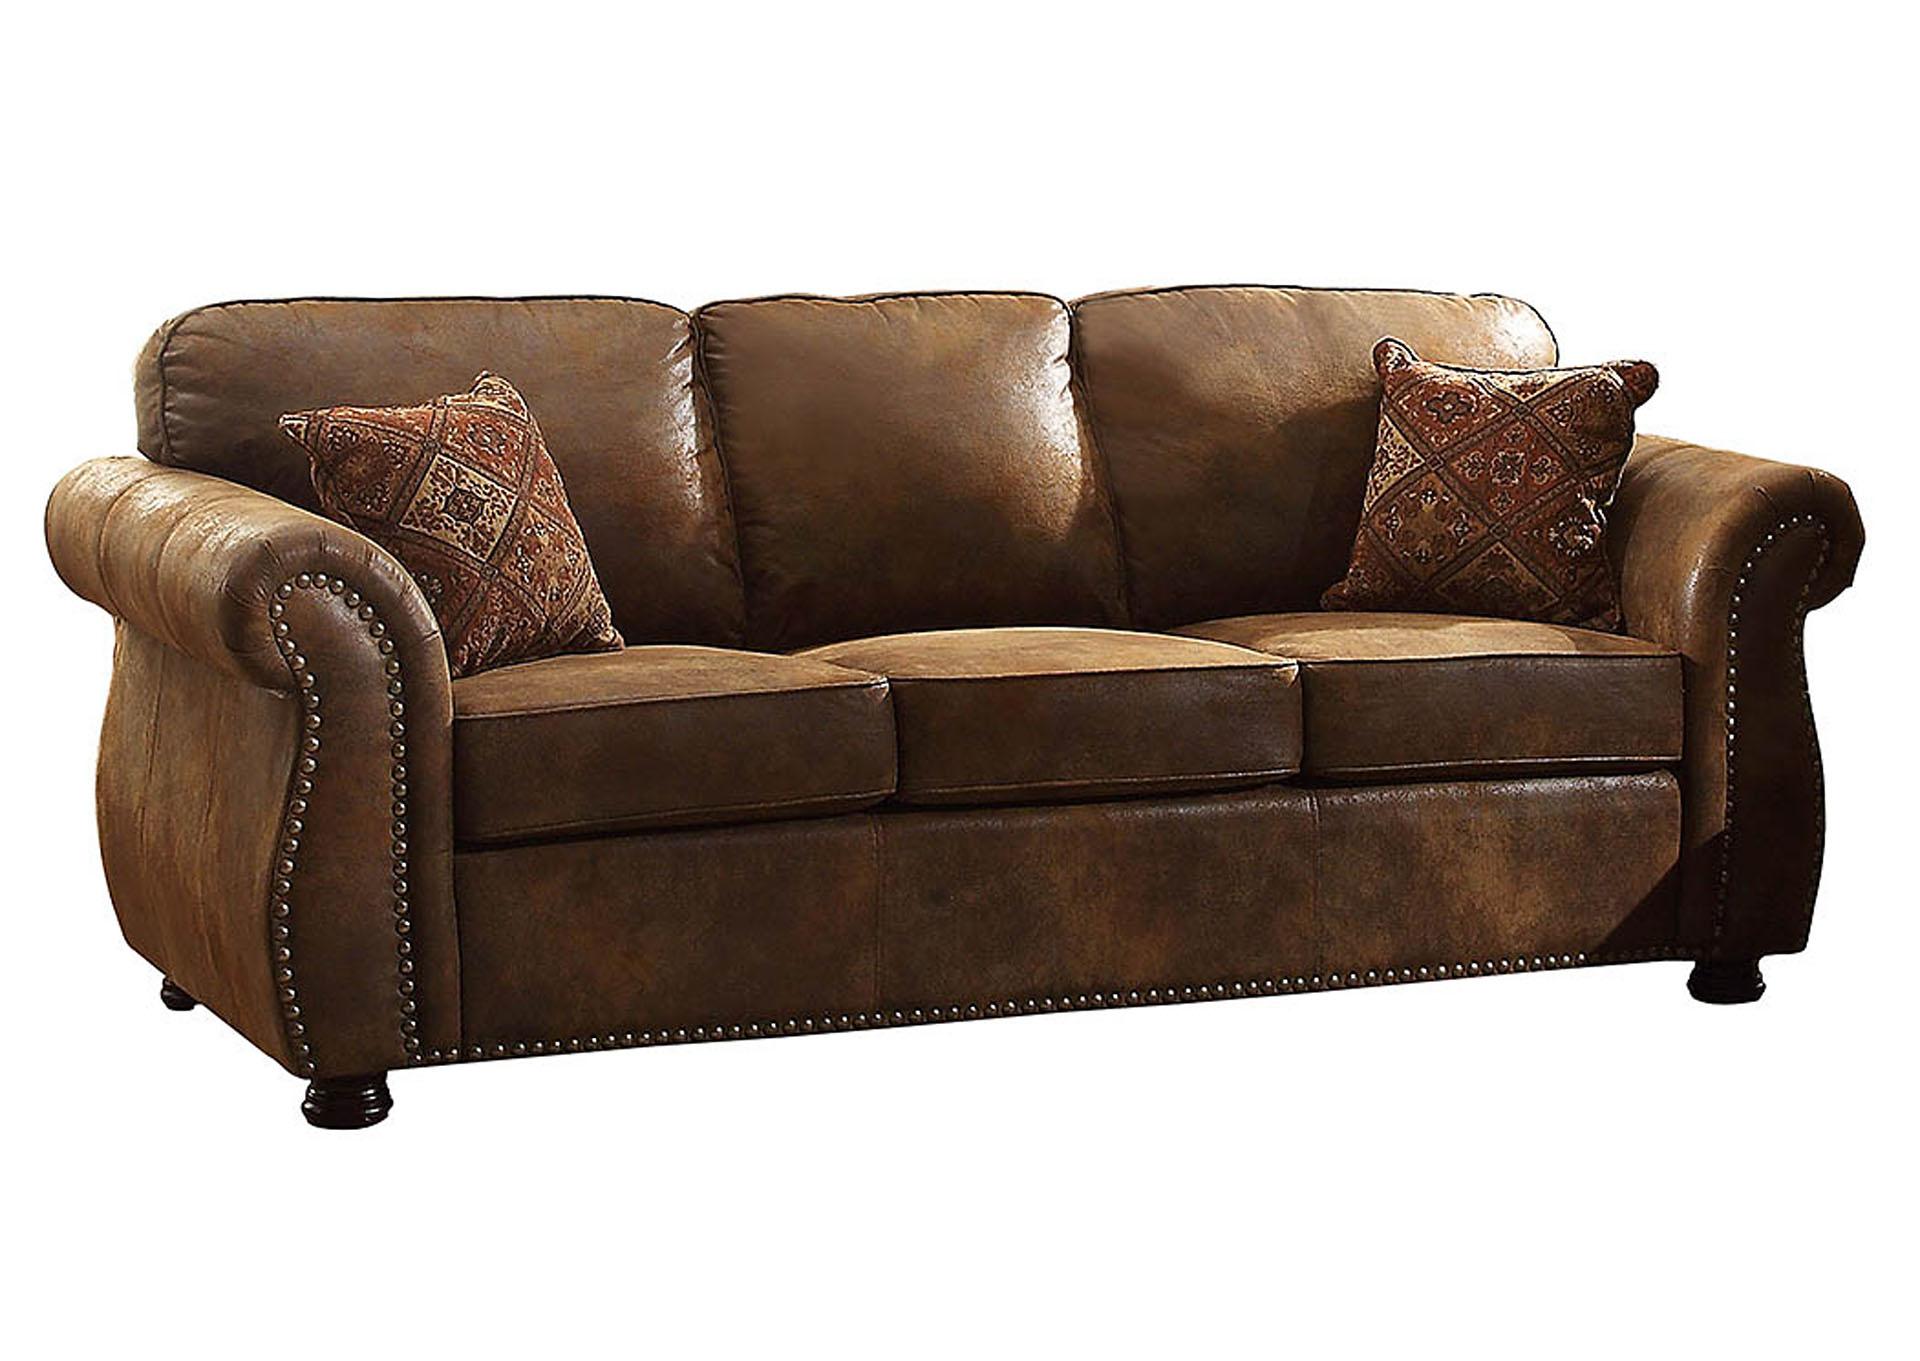 sleeper sofas chicago il white slipcovered sofa comfy furniture corvallis bomber jacket microfiber w mattress homelegance